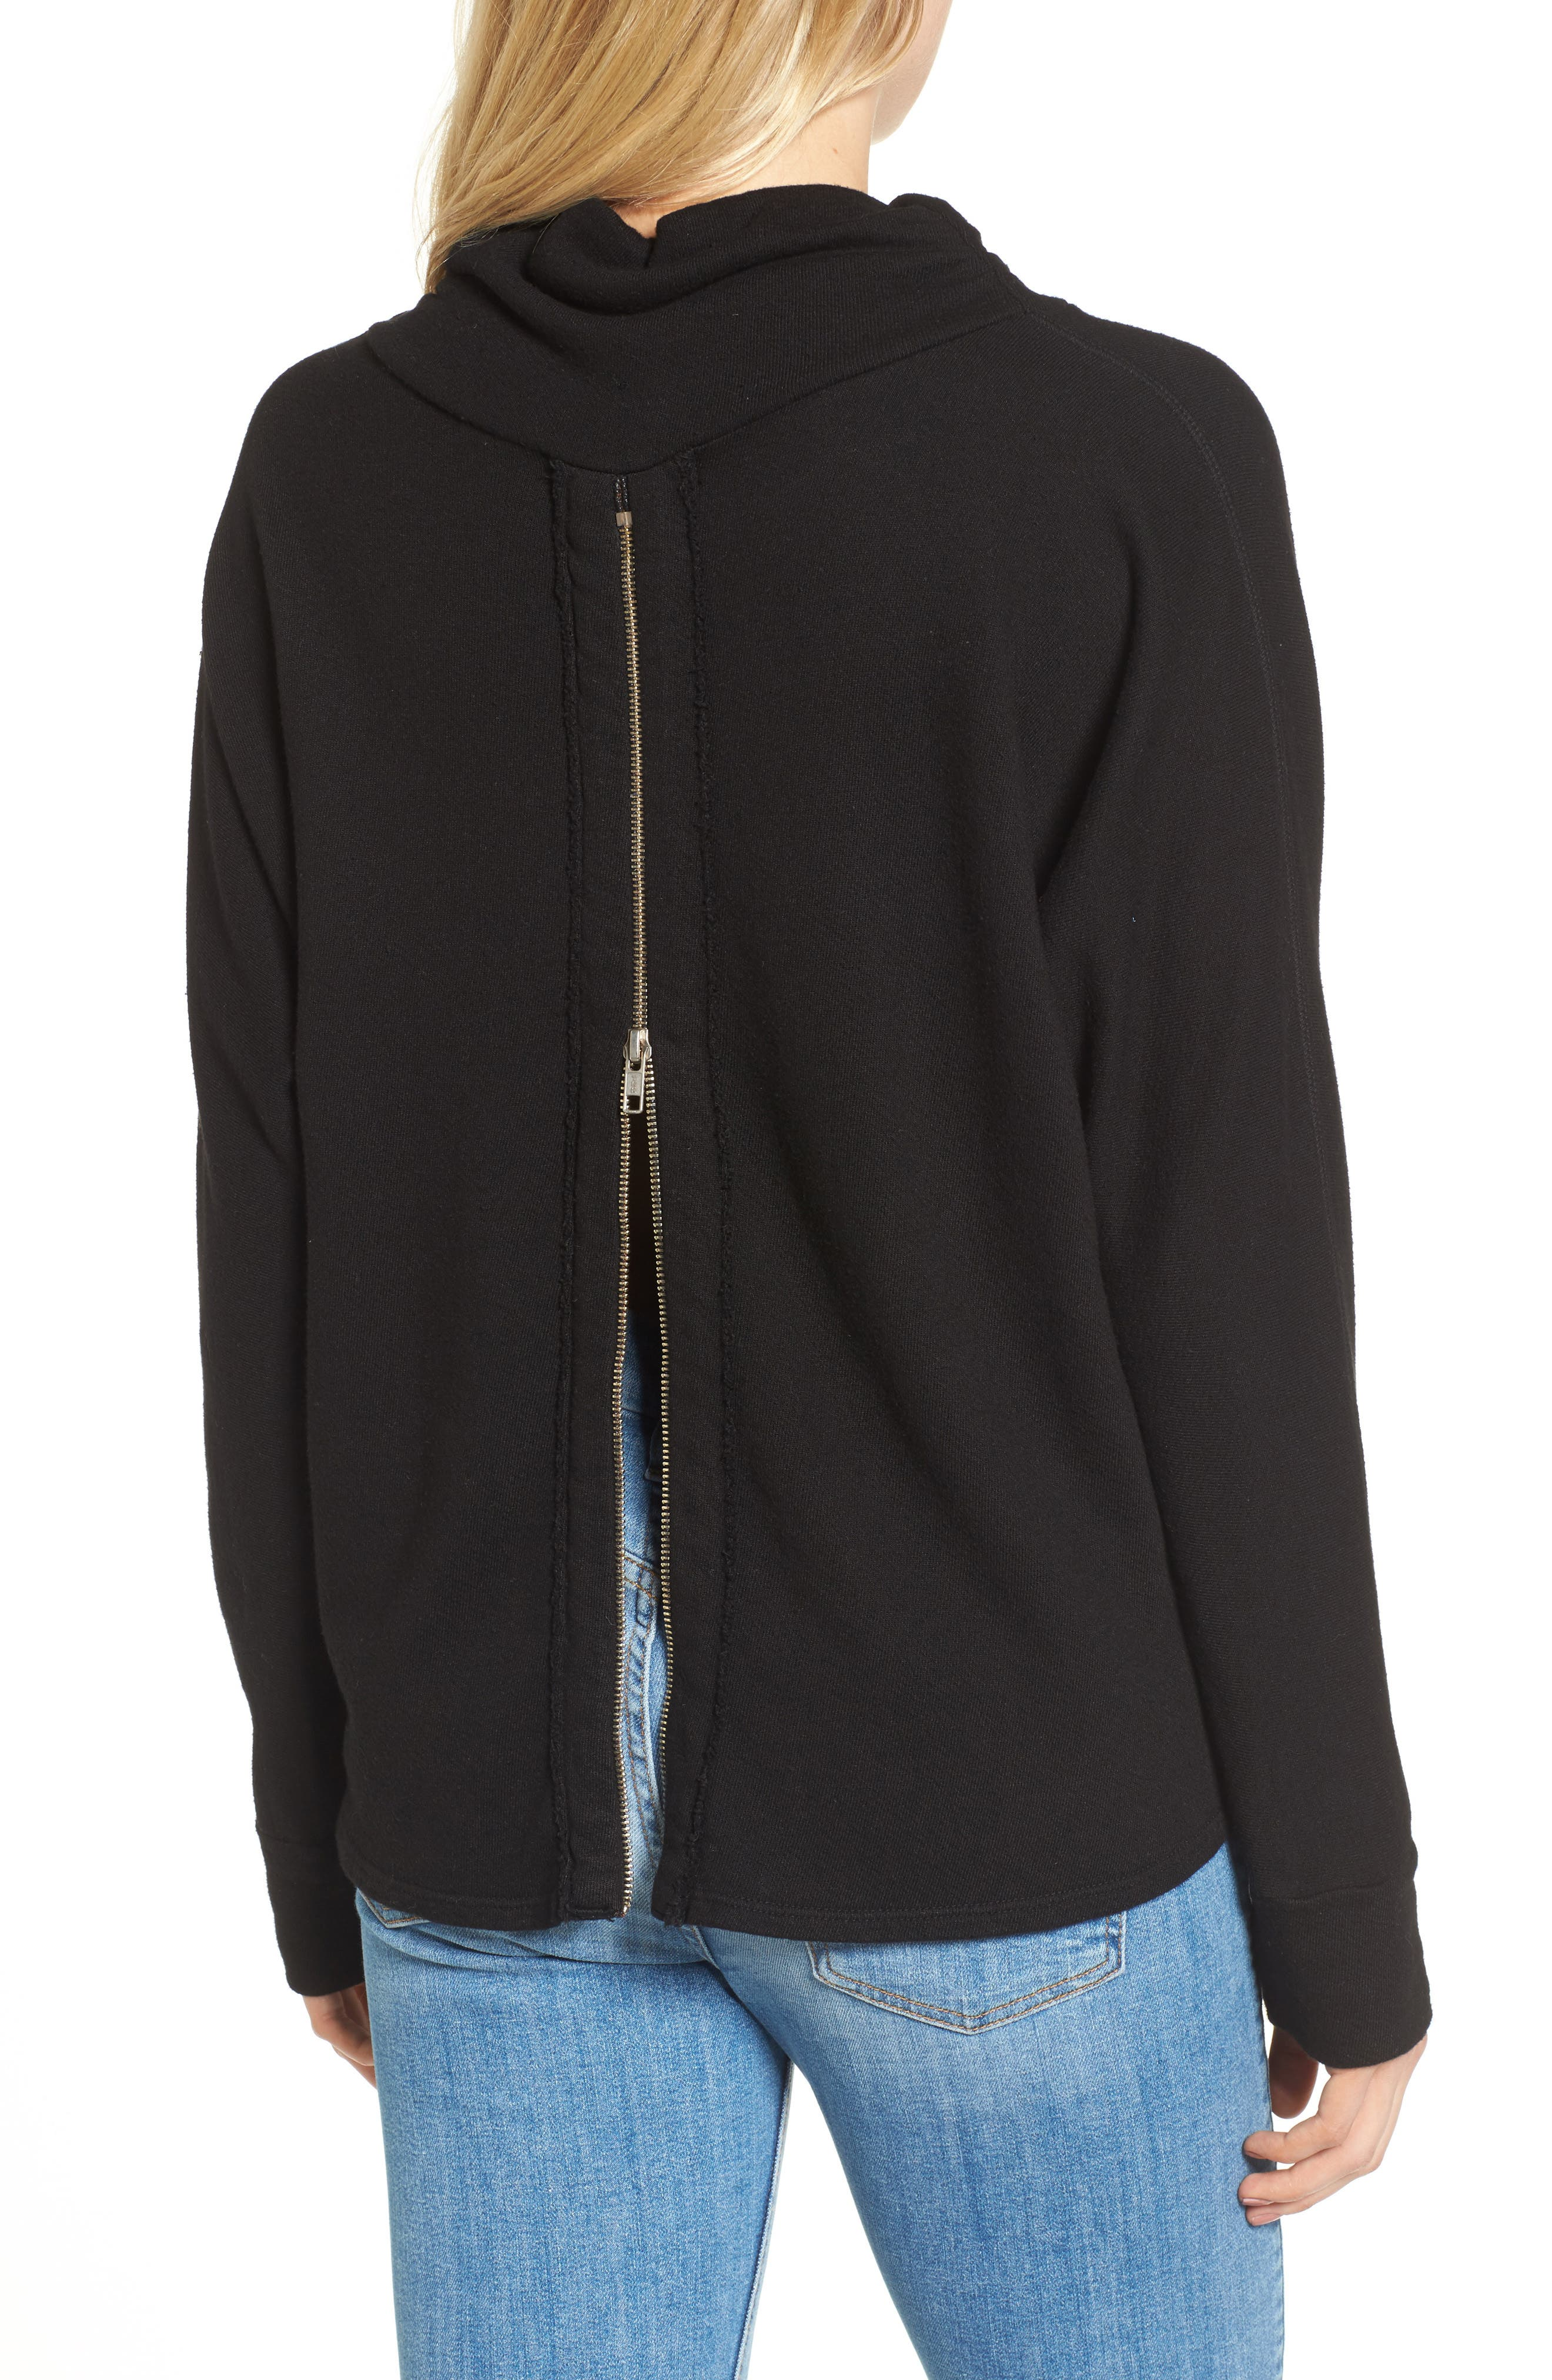 Helix Turtleneck Sweatshirt,                             Alternate thumbnail 2, color,                             001